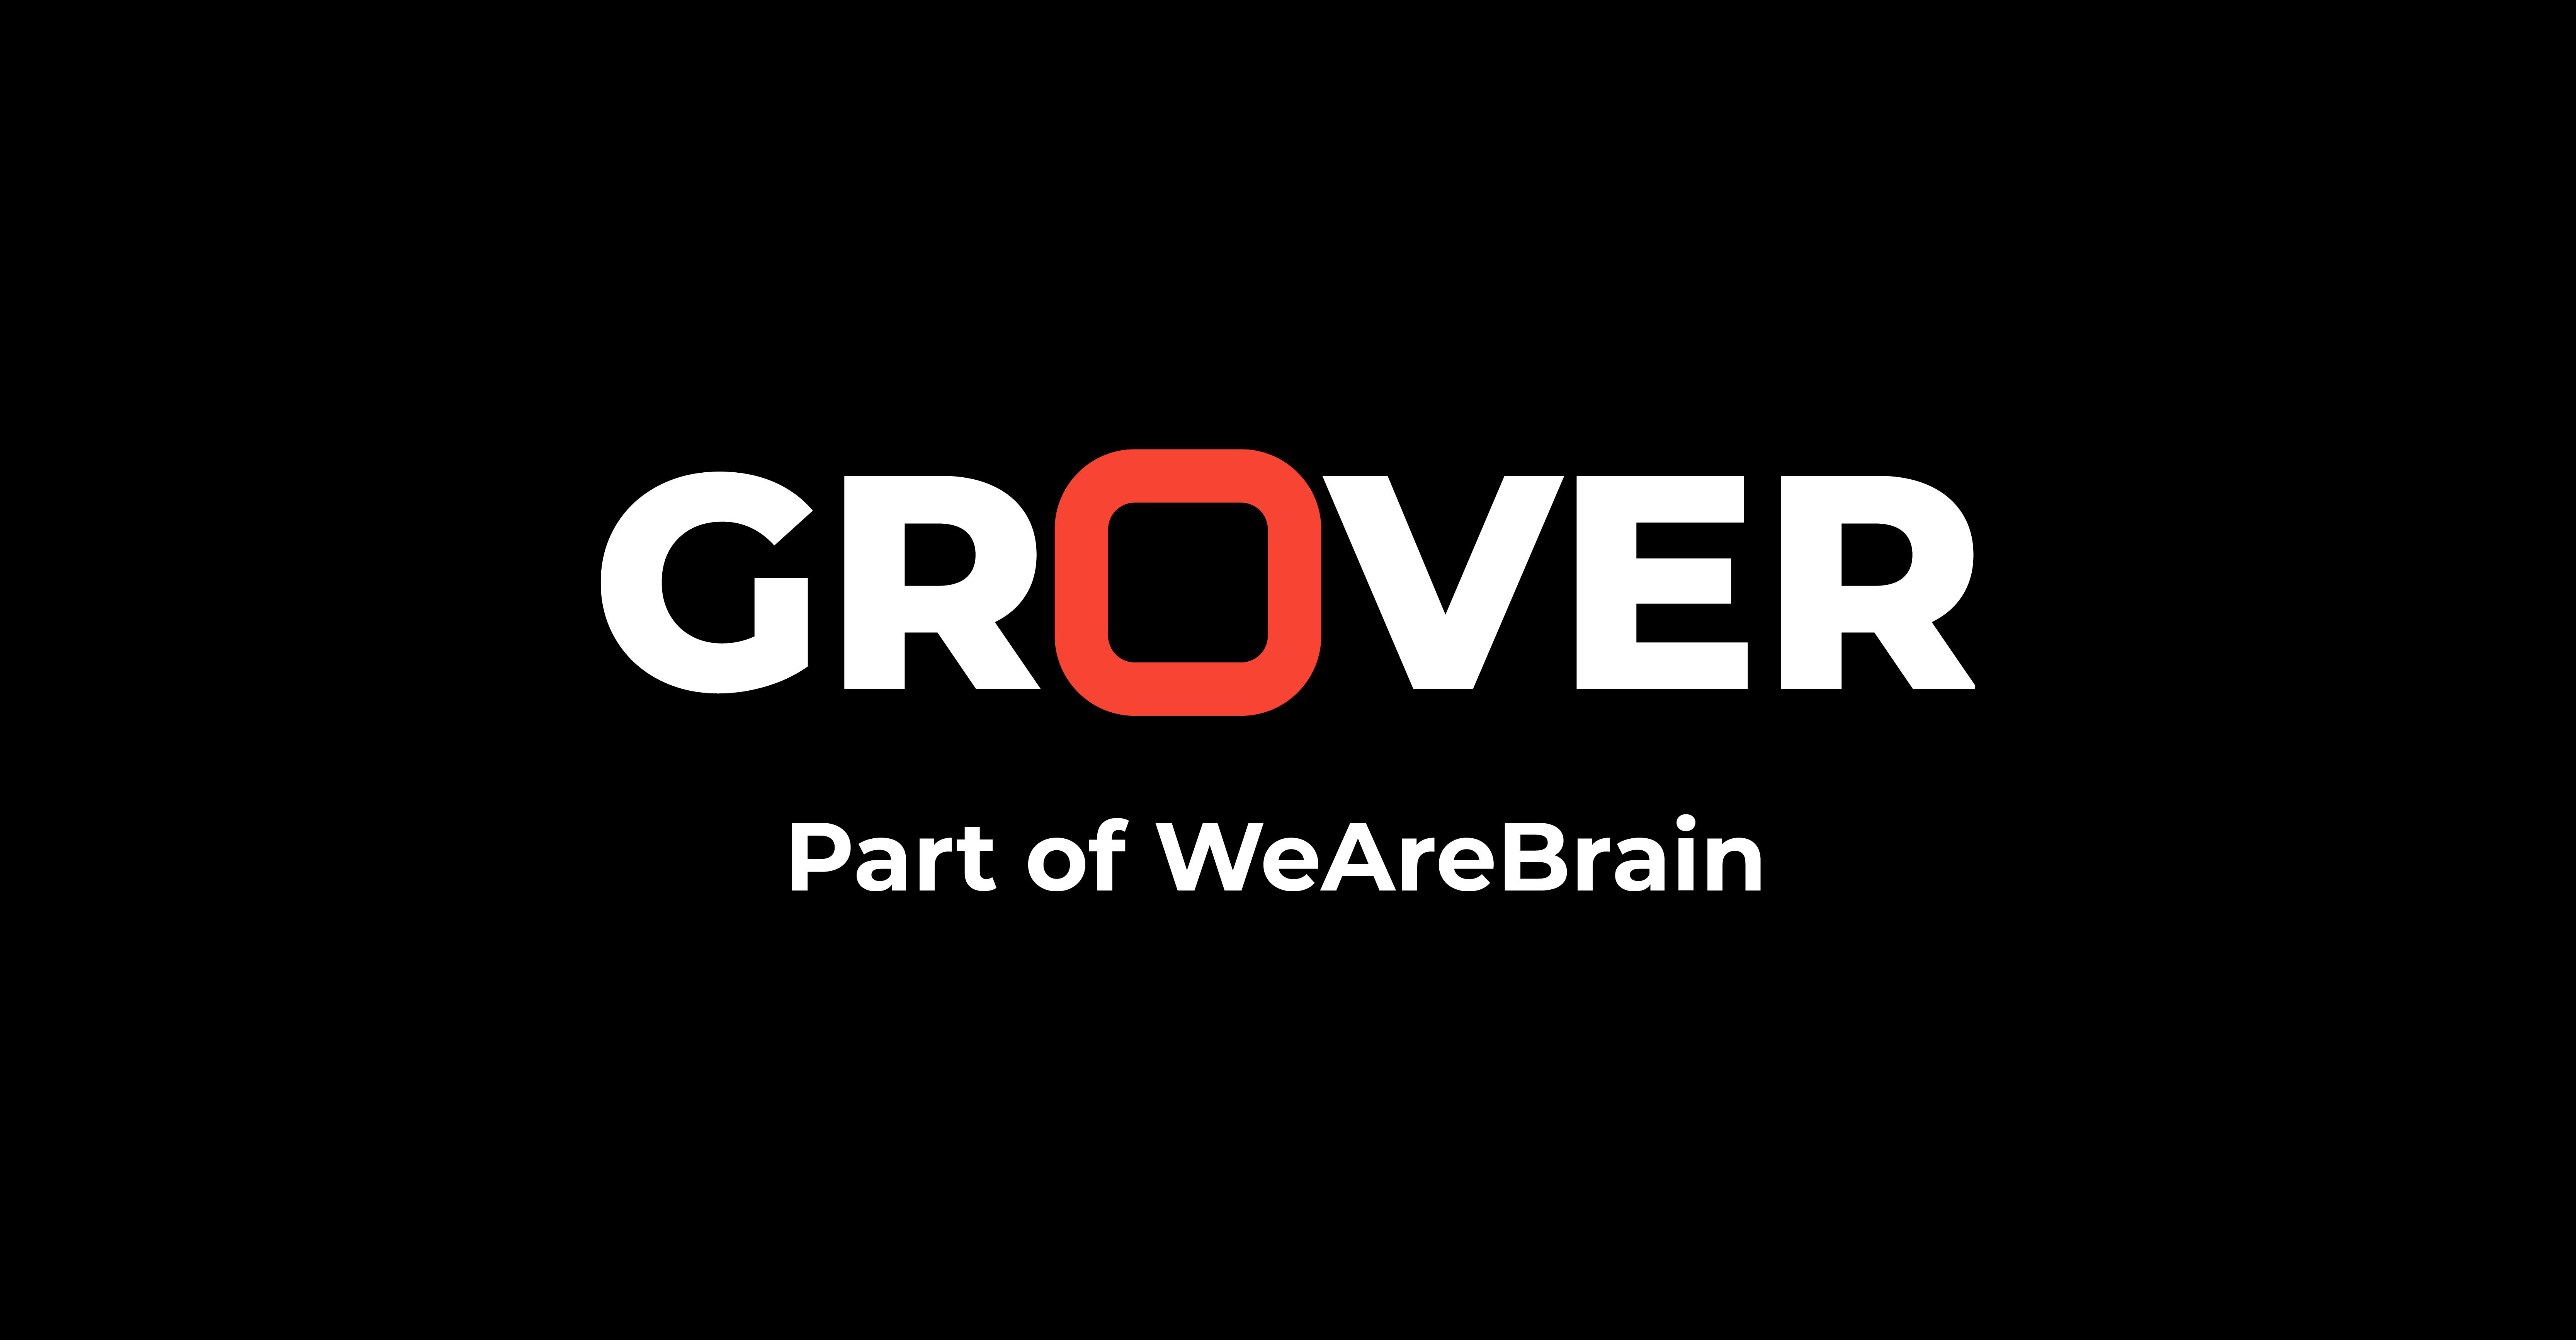 Grover agency logo